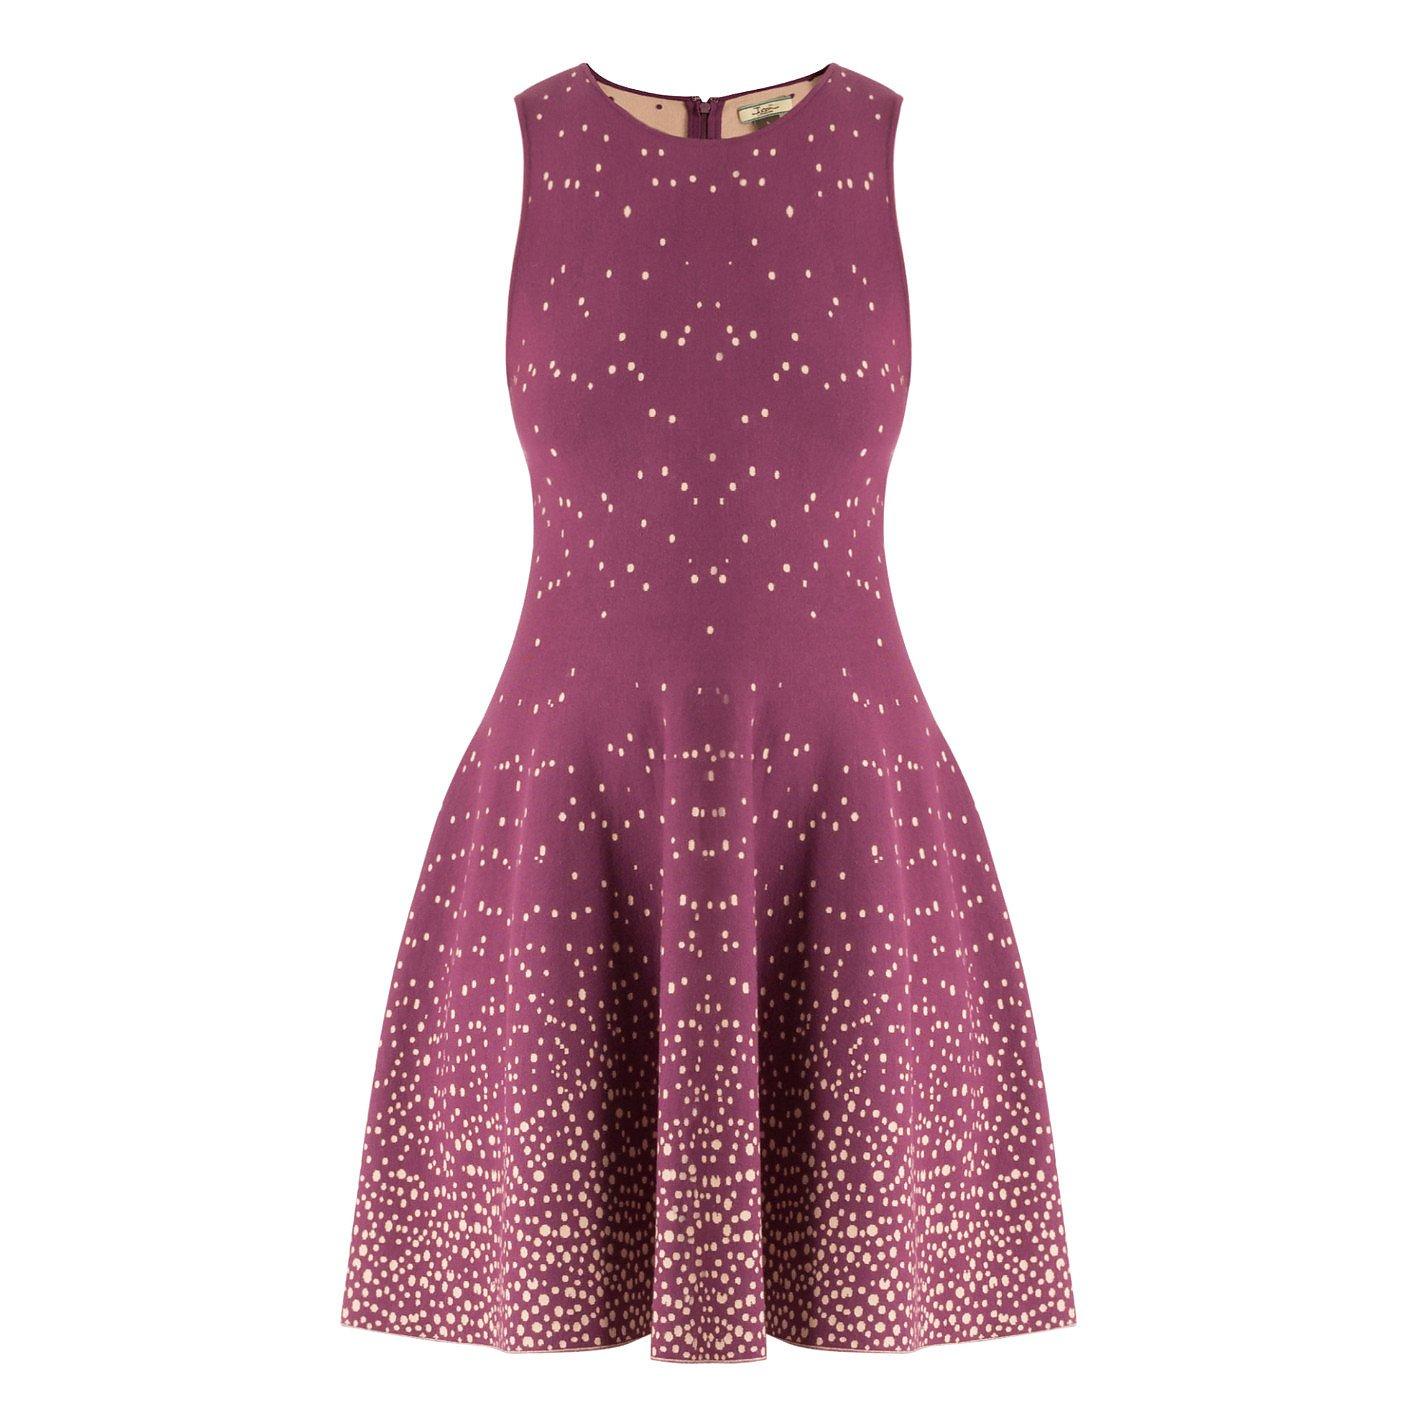 ISSA Dotted Knit Dress